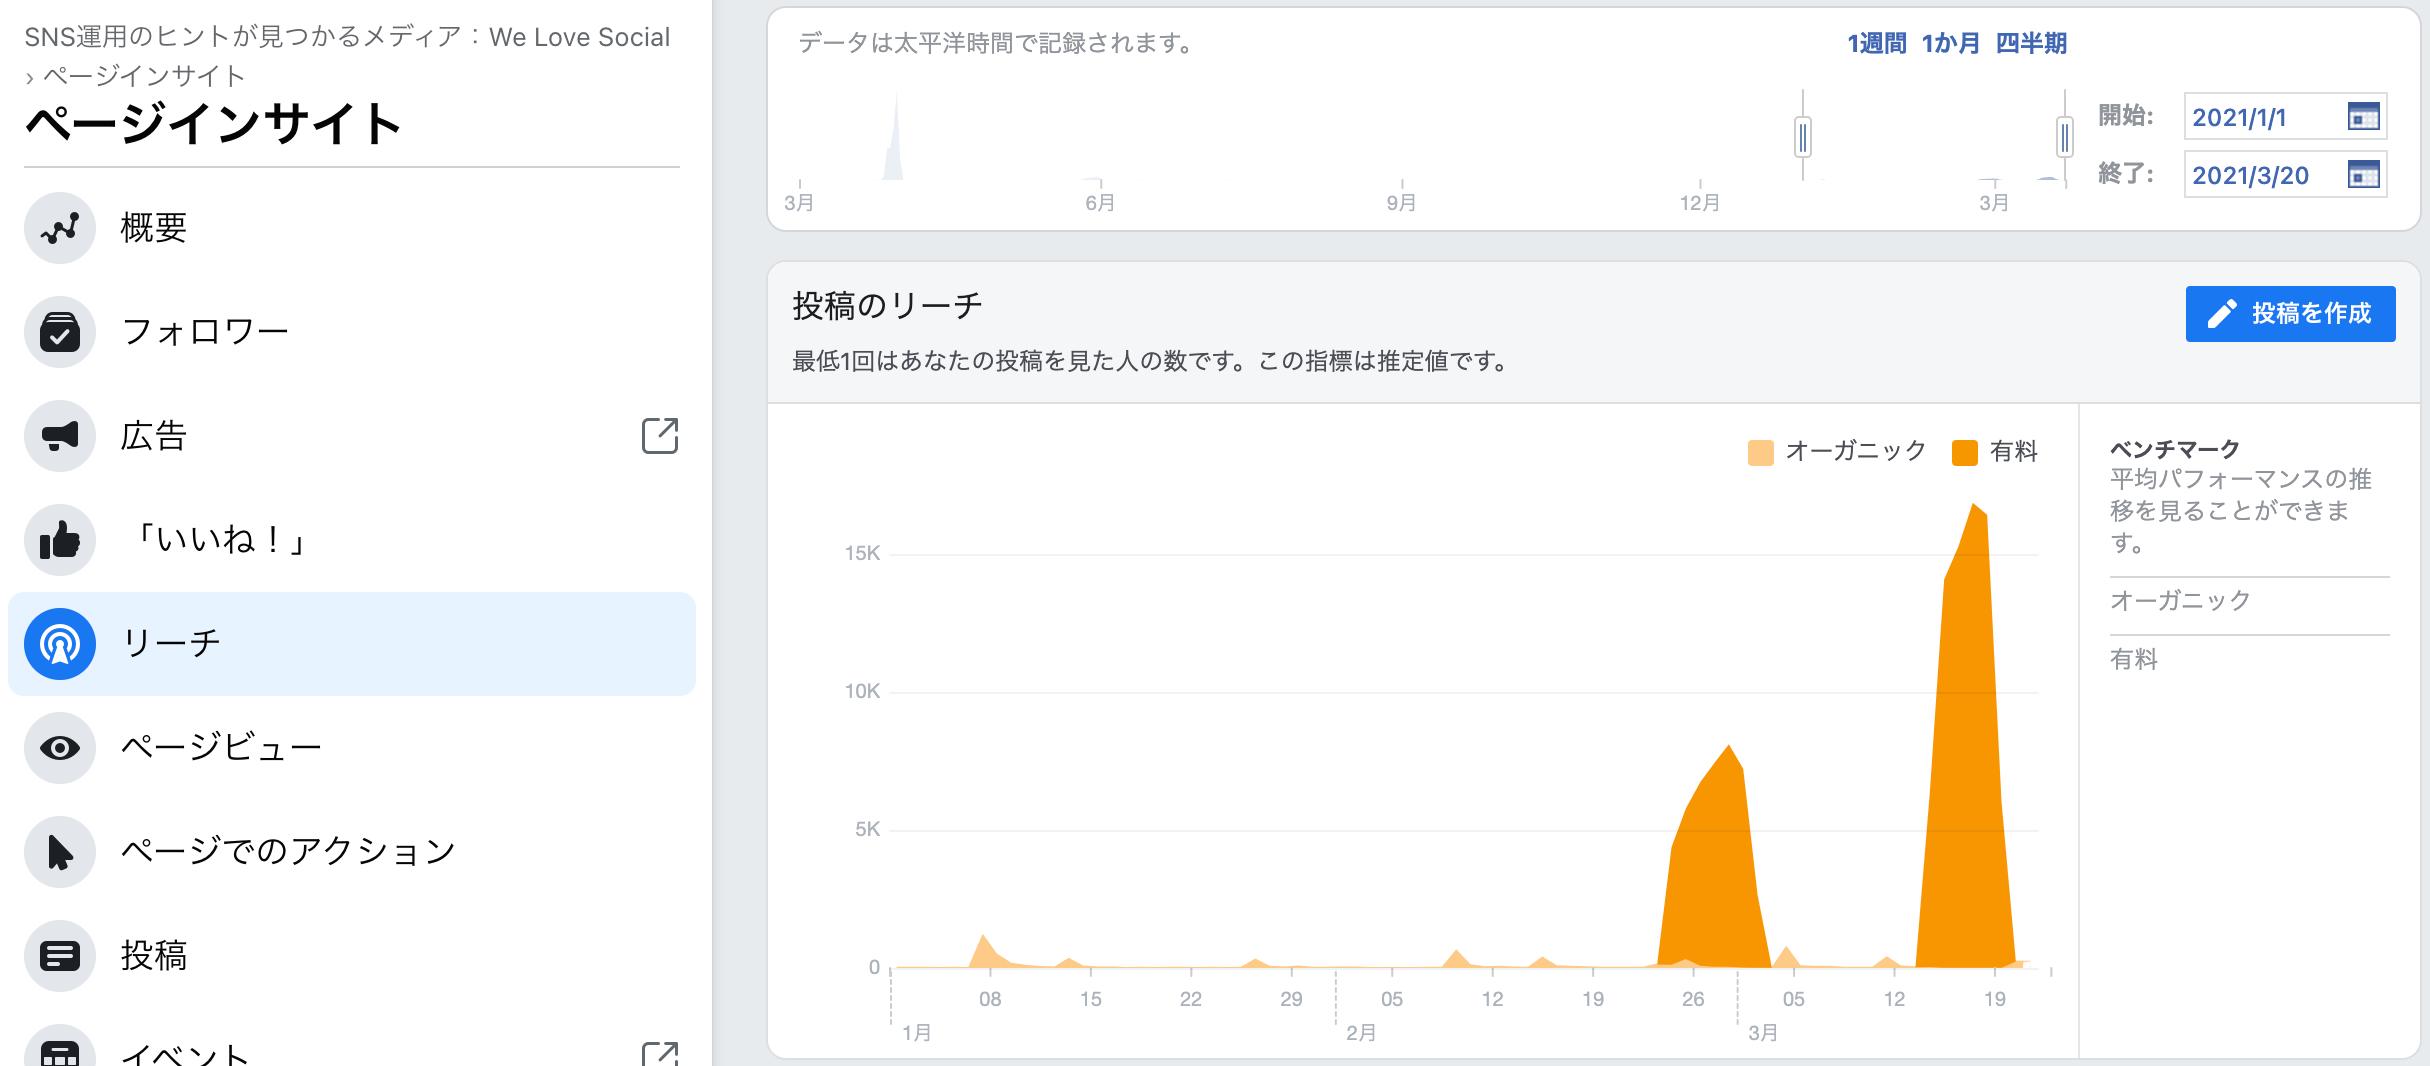 Facebookインサイト リーチ